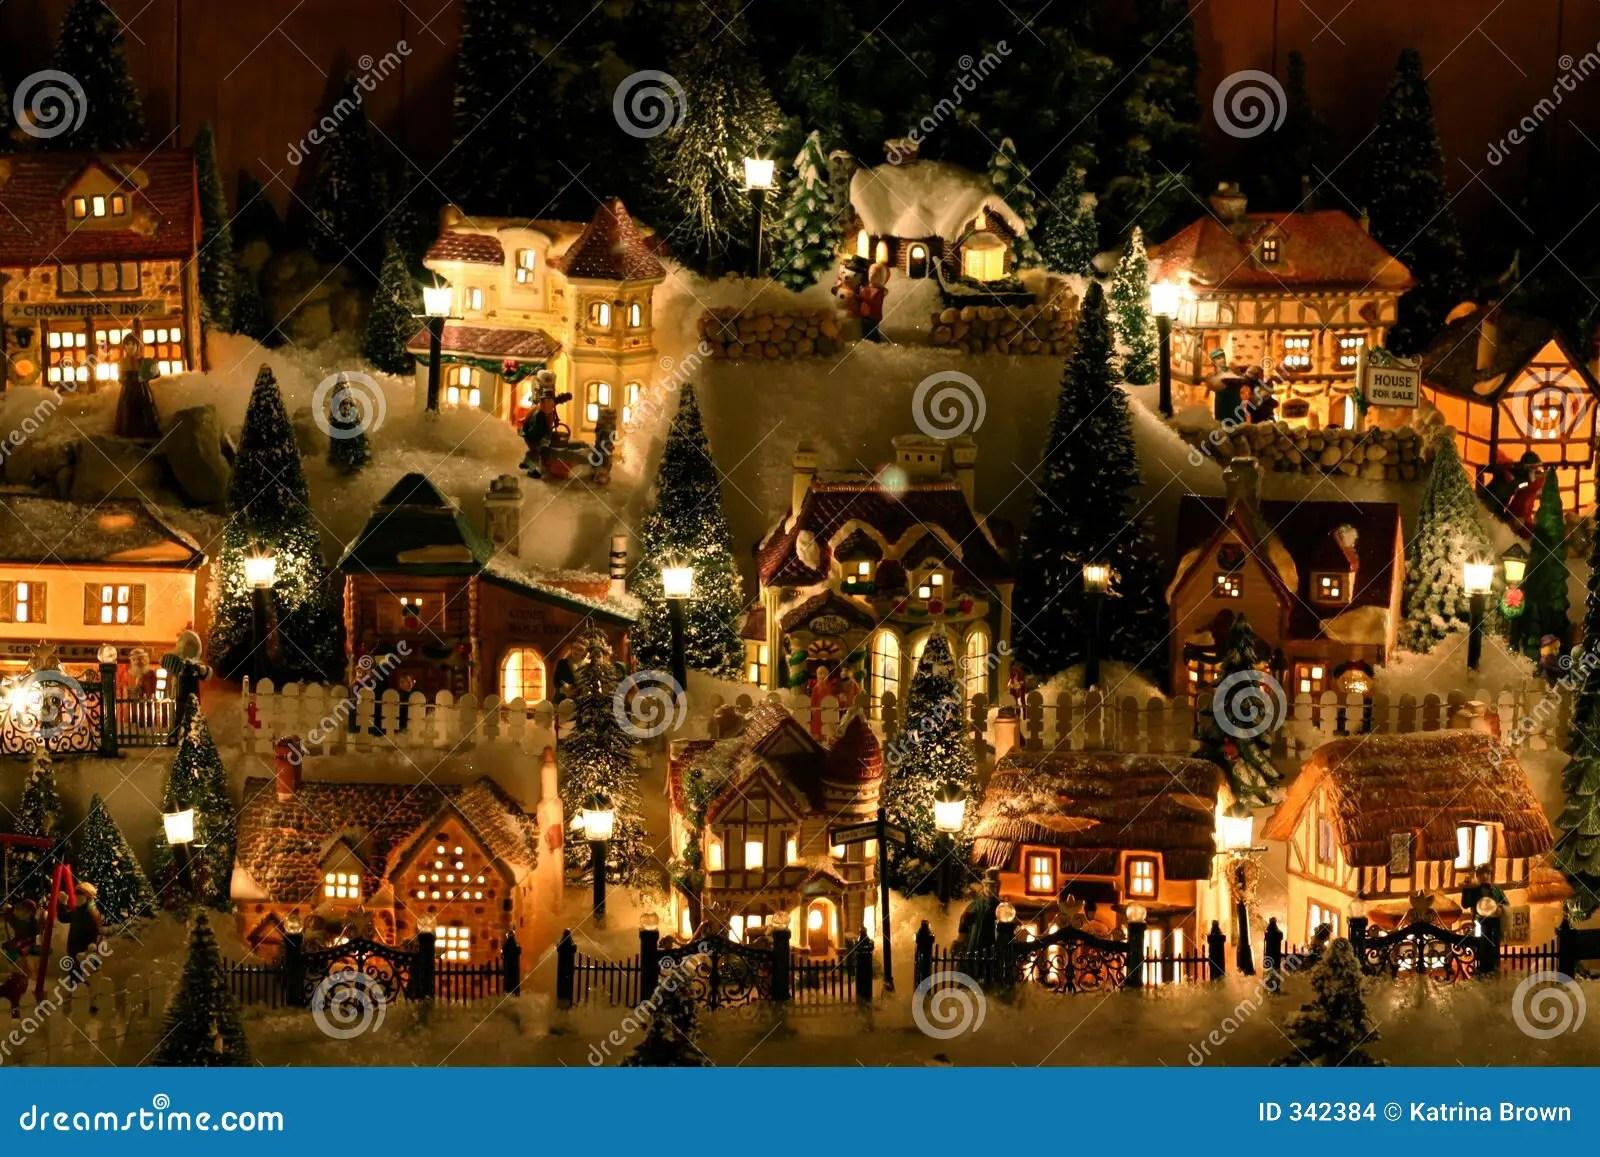 Lifelike 3d Wallpaper Miniature Christmas Village Stock Photo Image Of